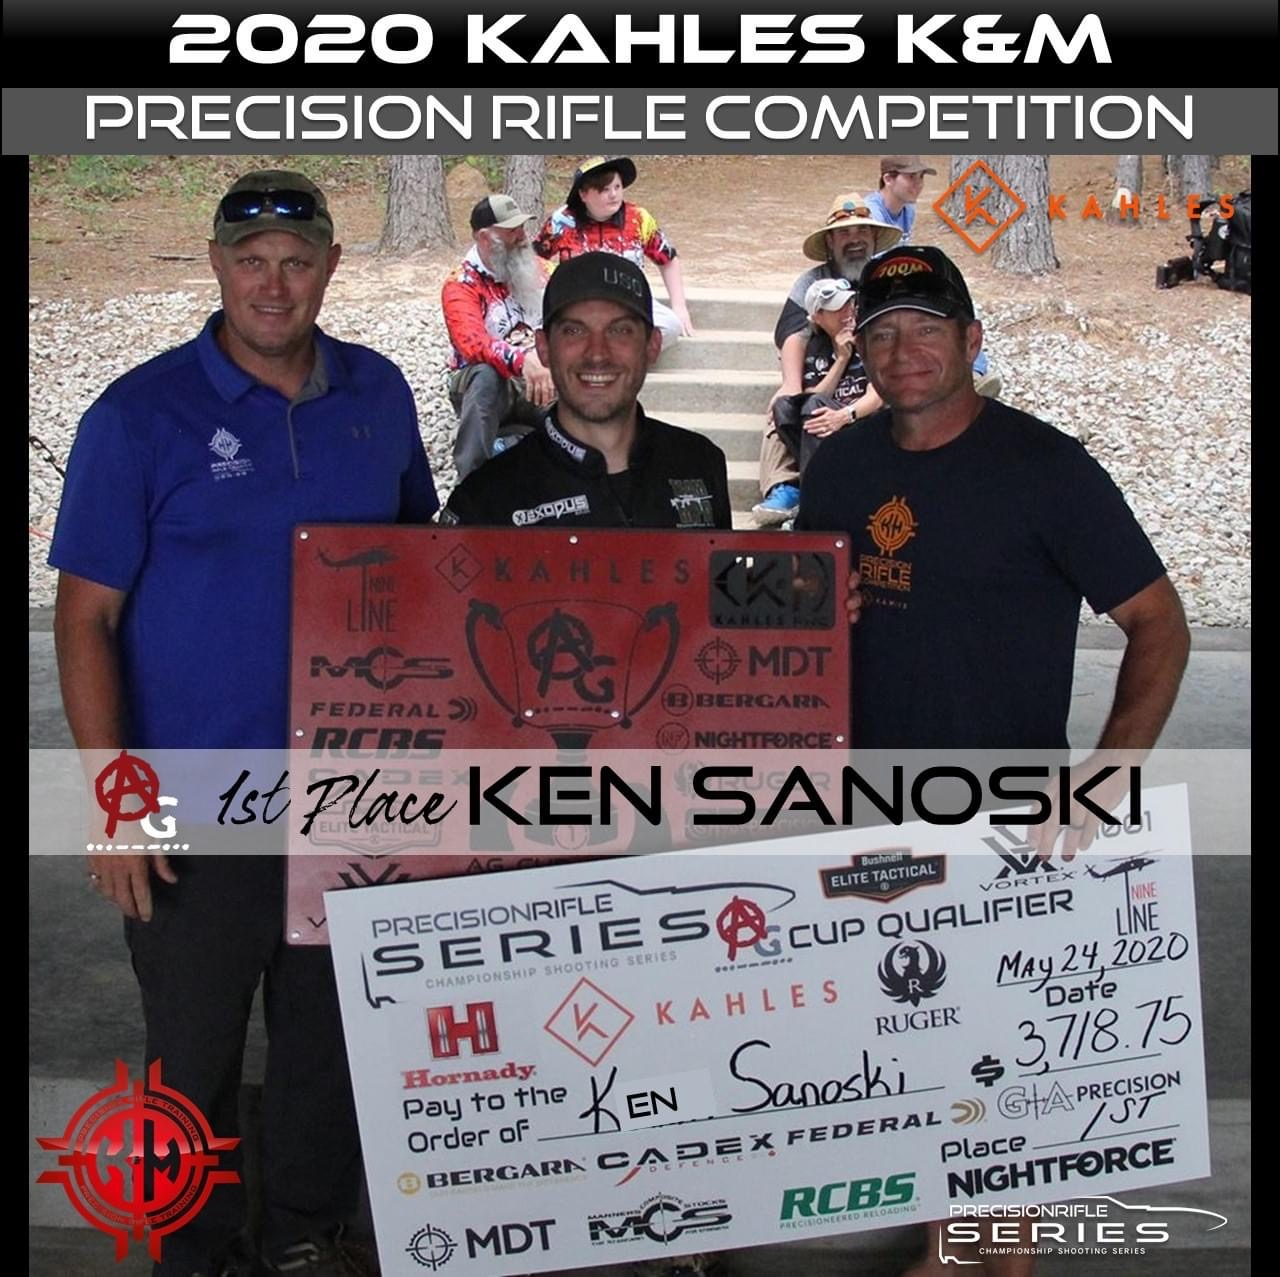 2020 Kahles K&M 1st Place Ken Sanoski